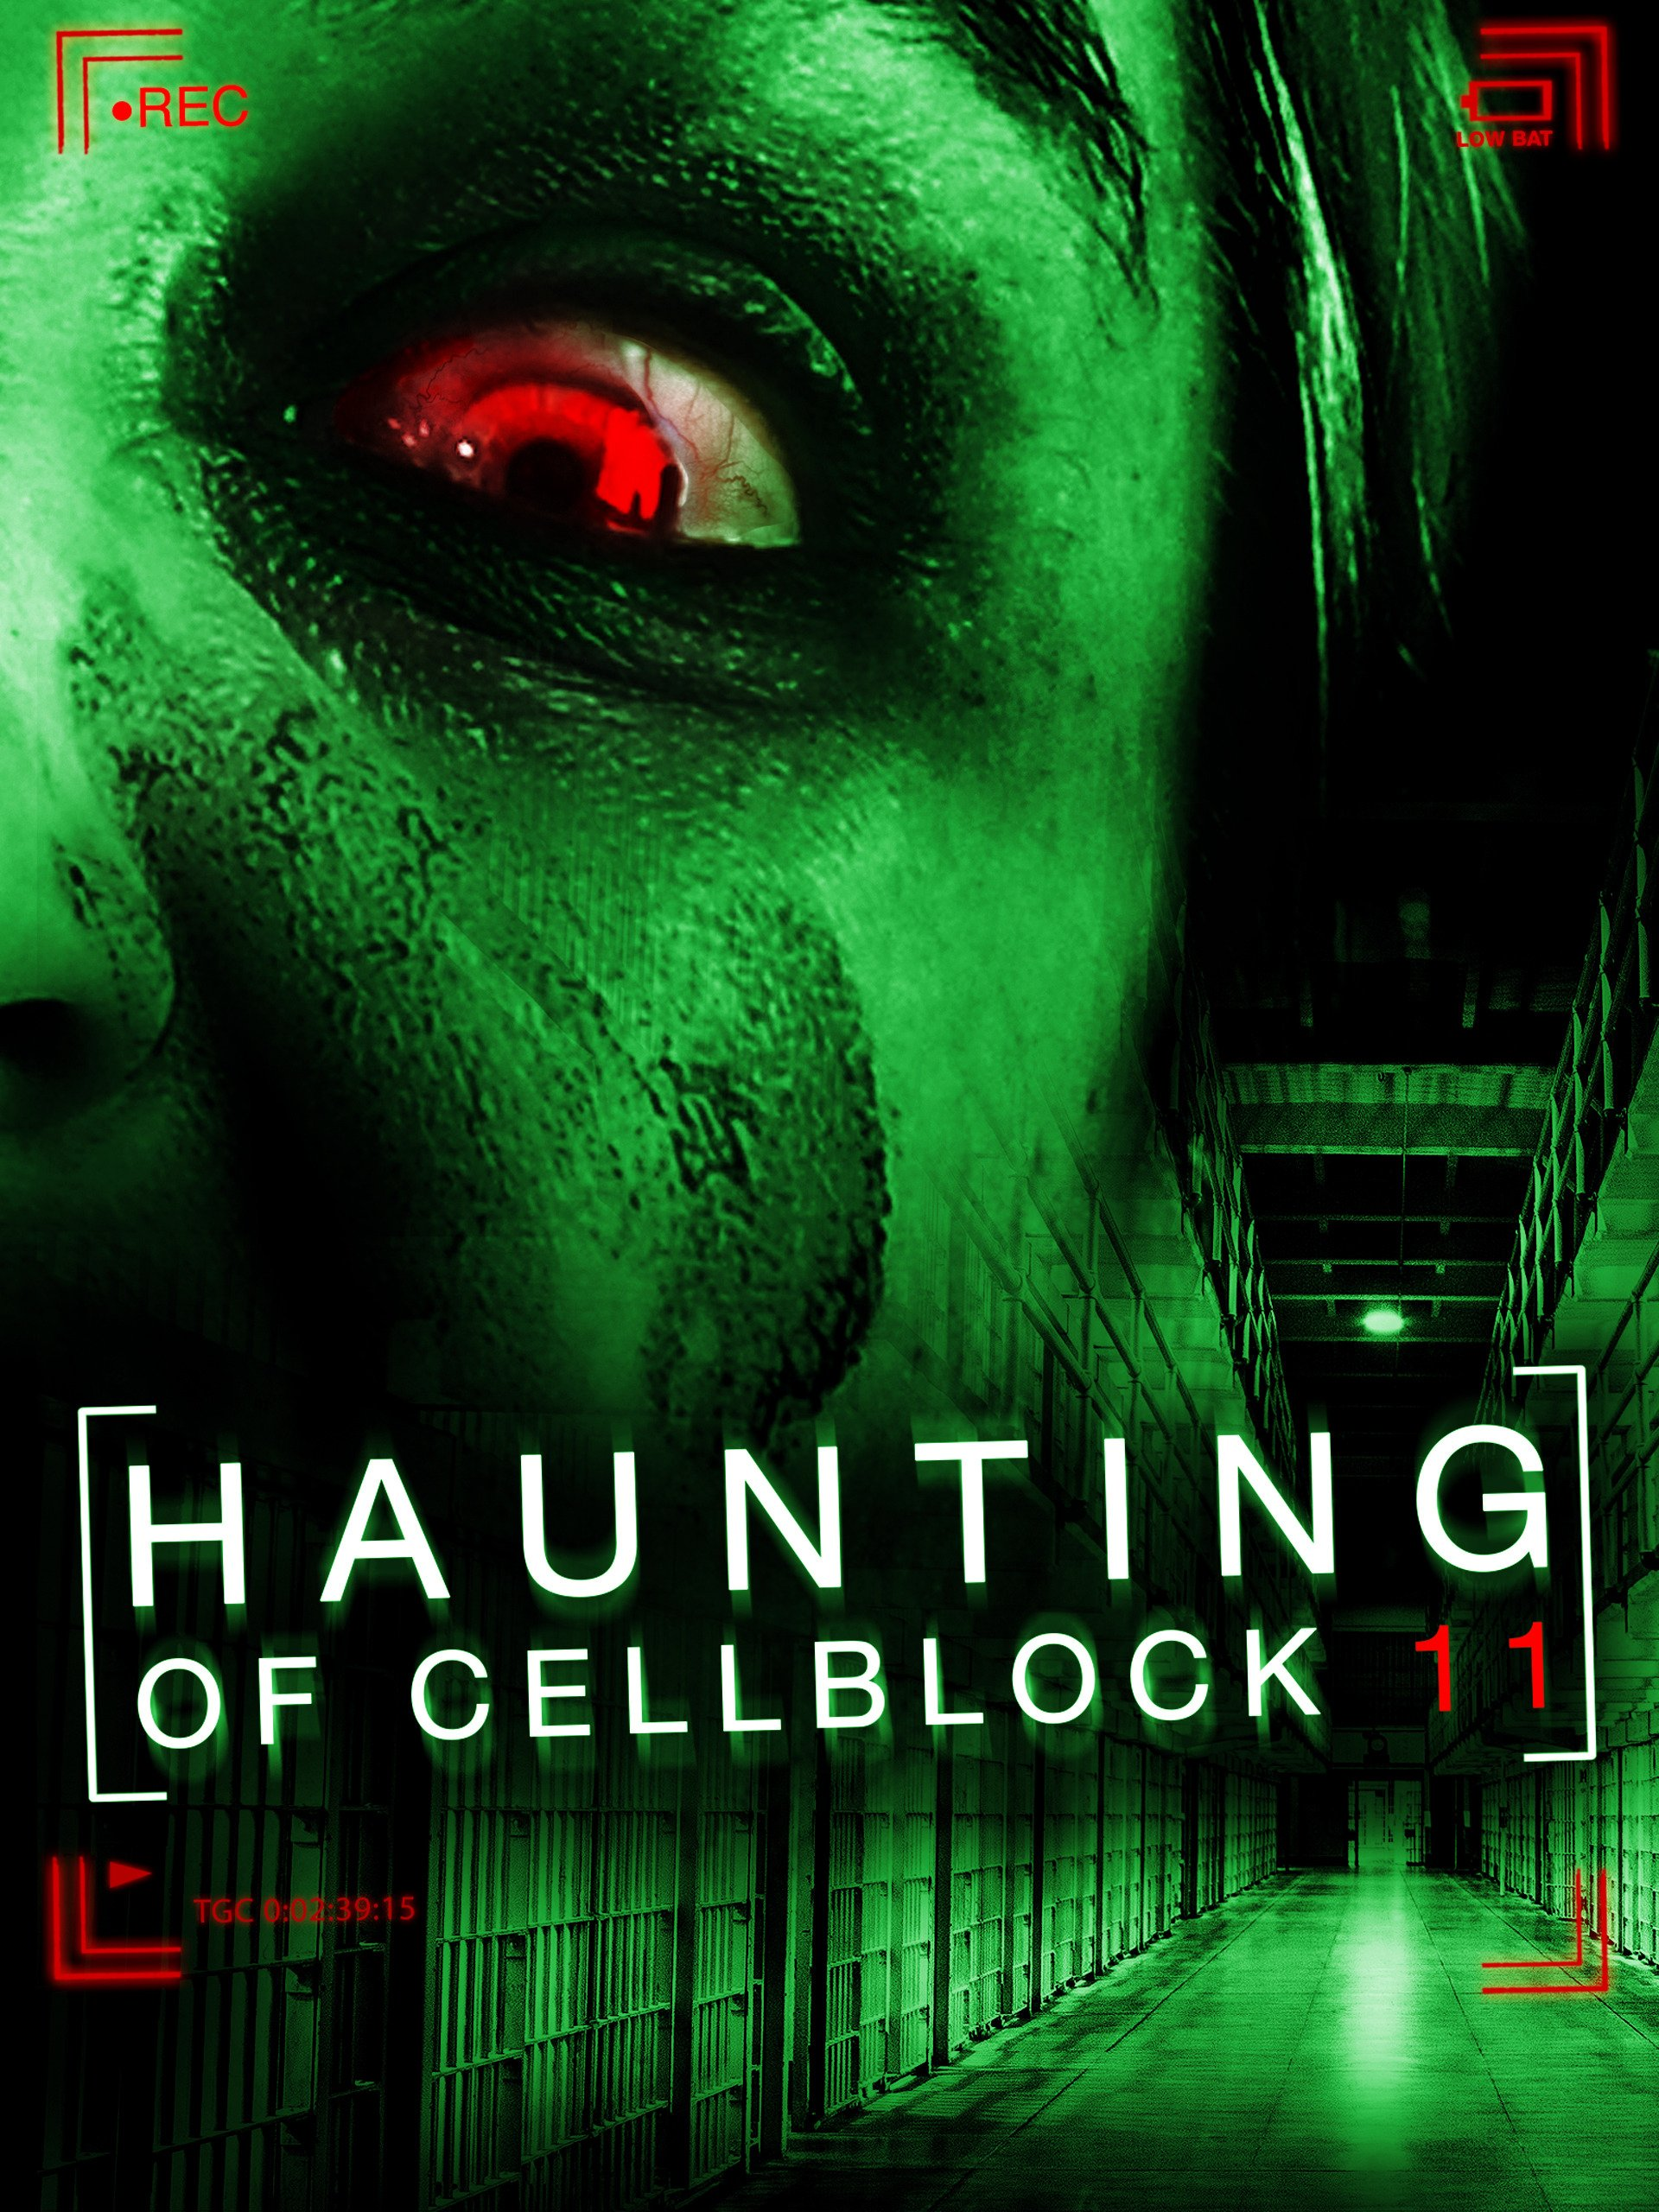 watch haunting of cellblock 11 online free